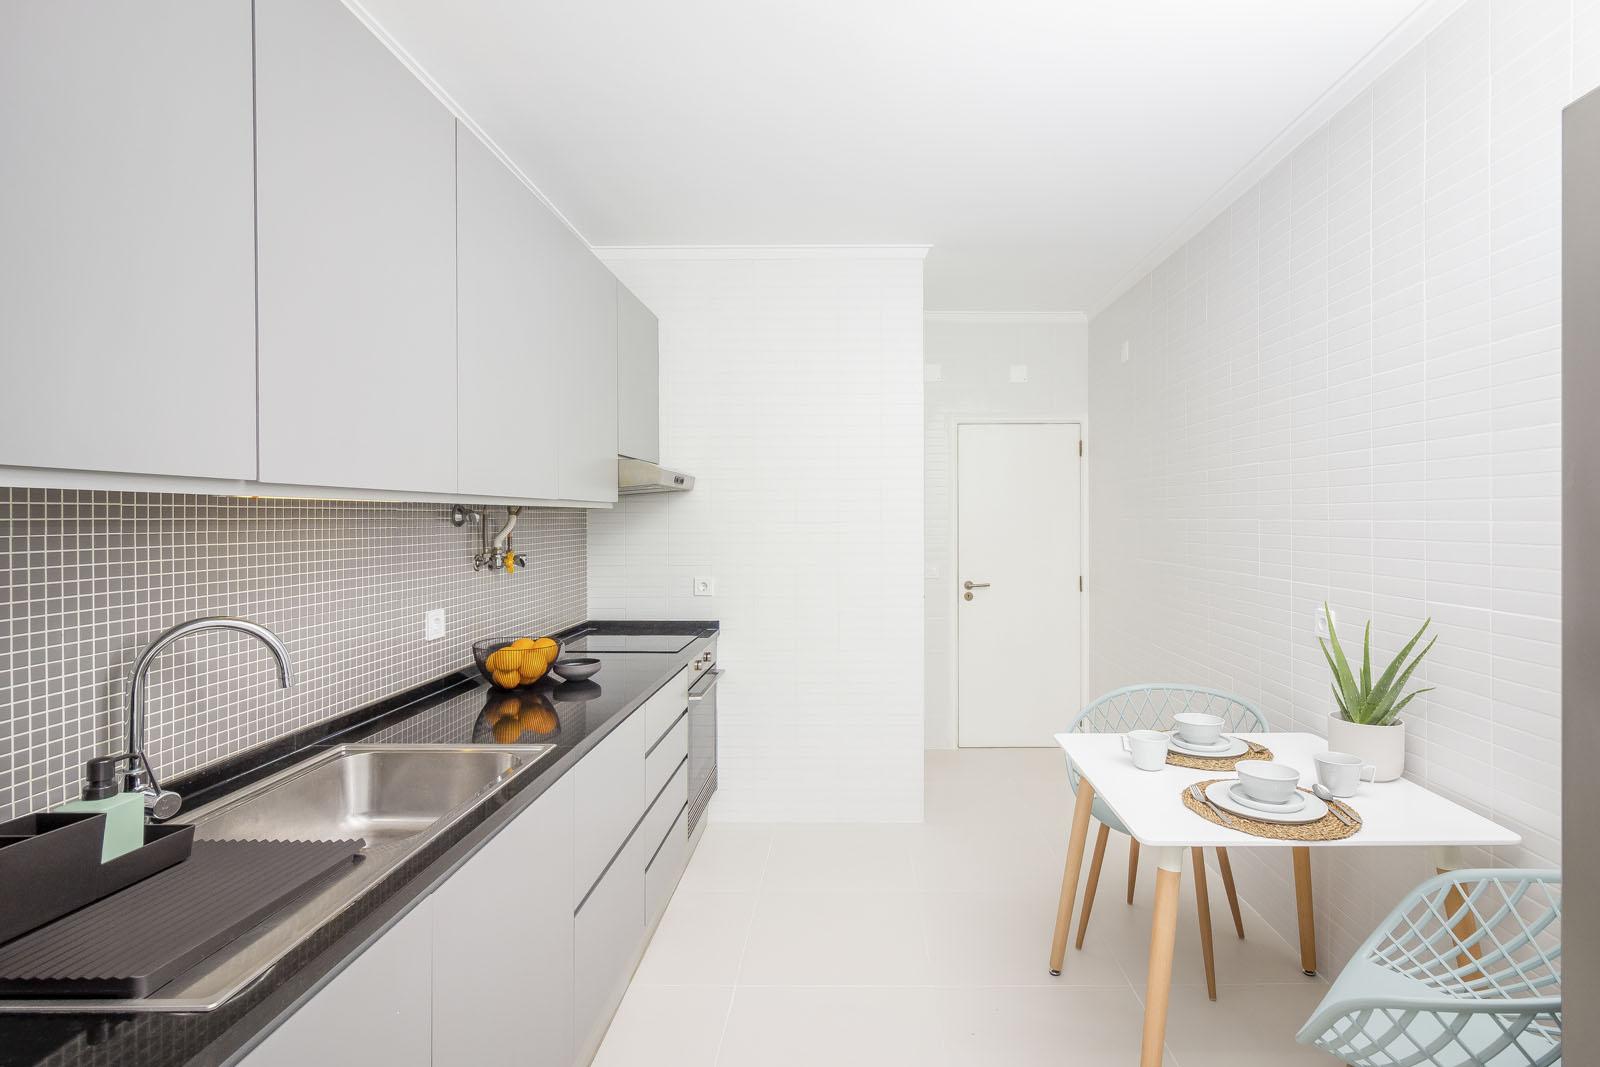 Fotografia imobiliaria - Rua Joly Braga Santos 0015.jpg